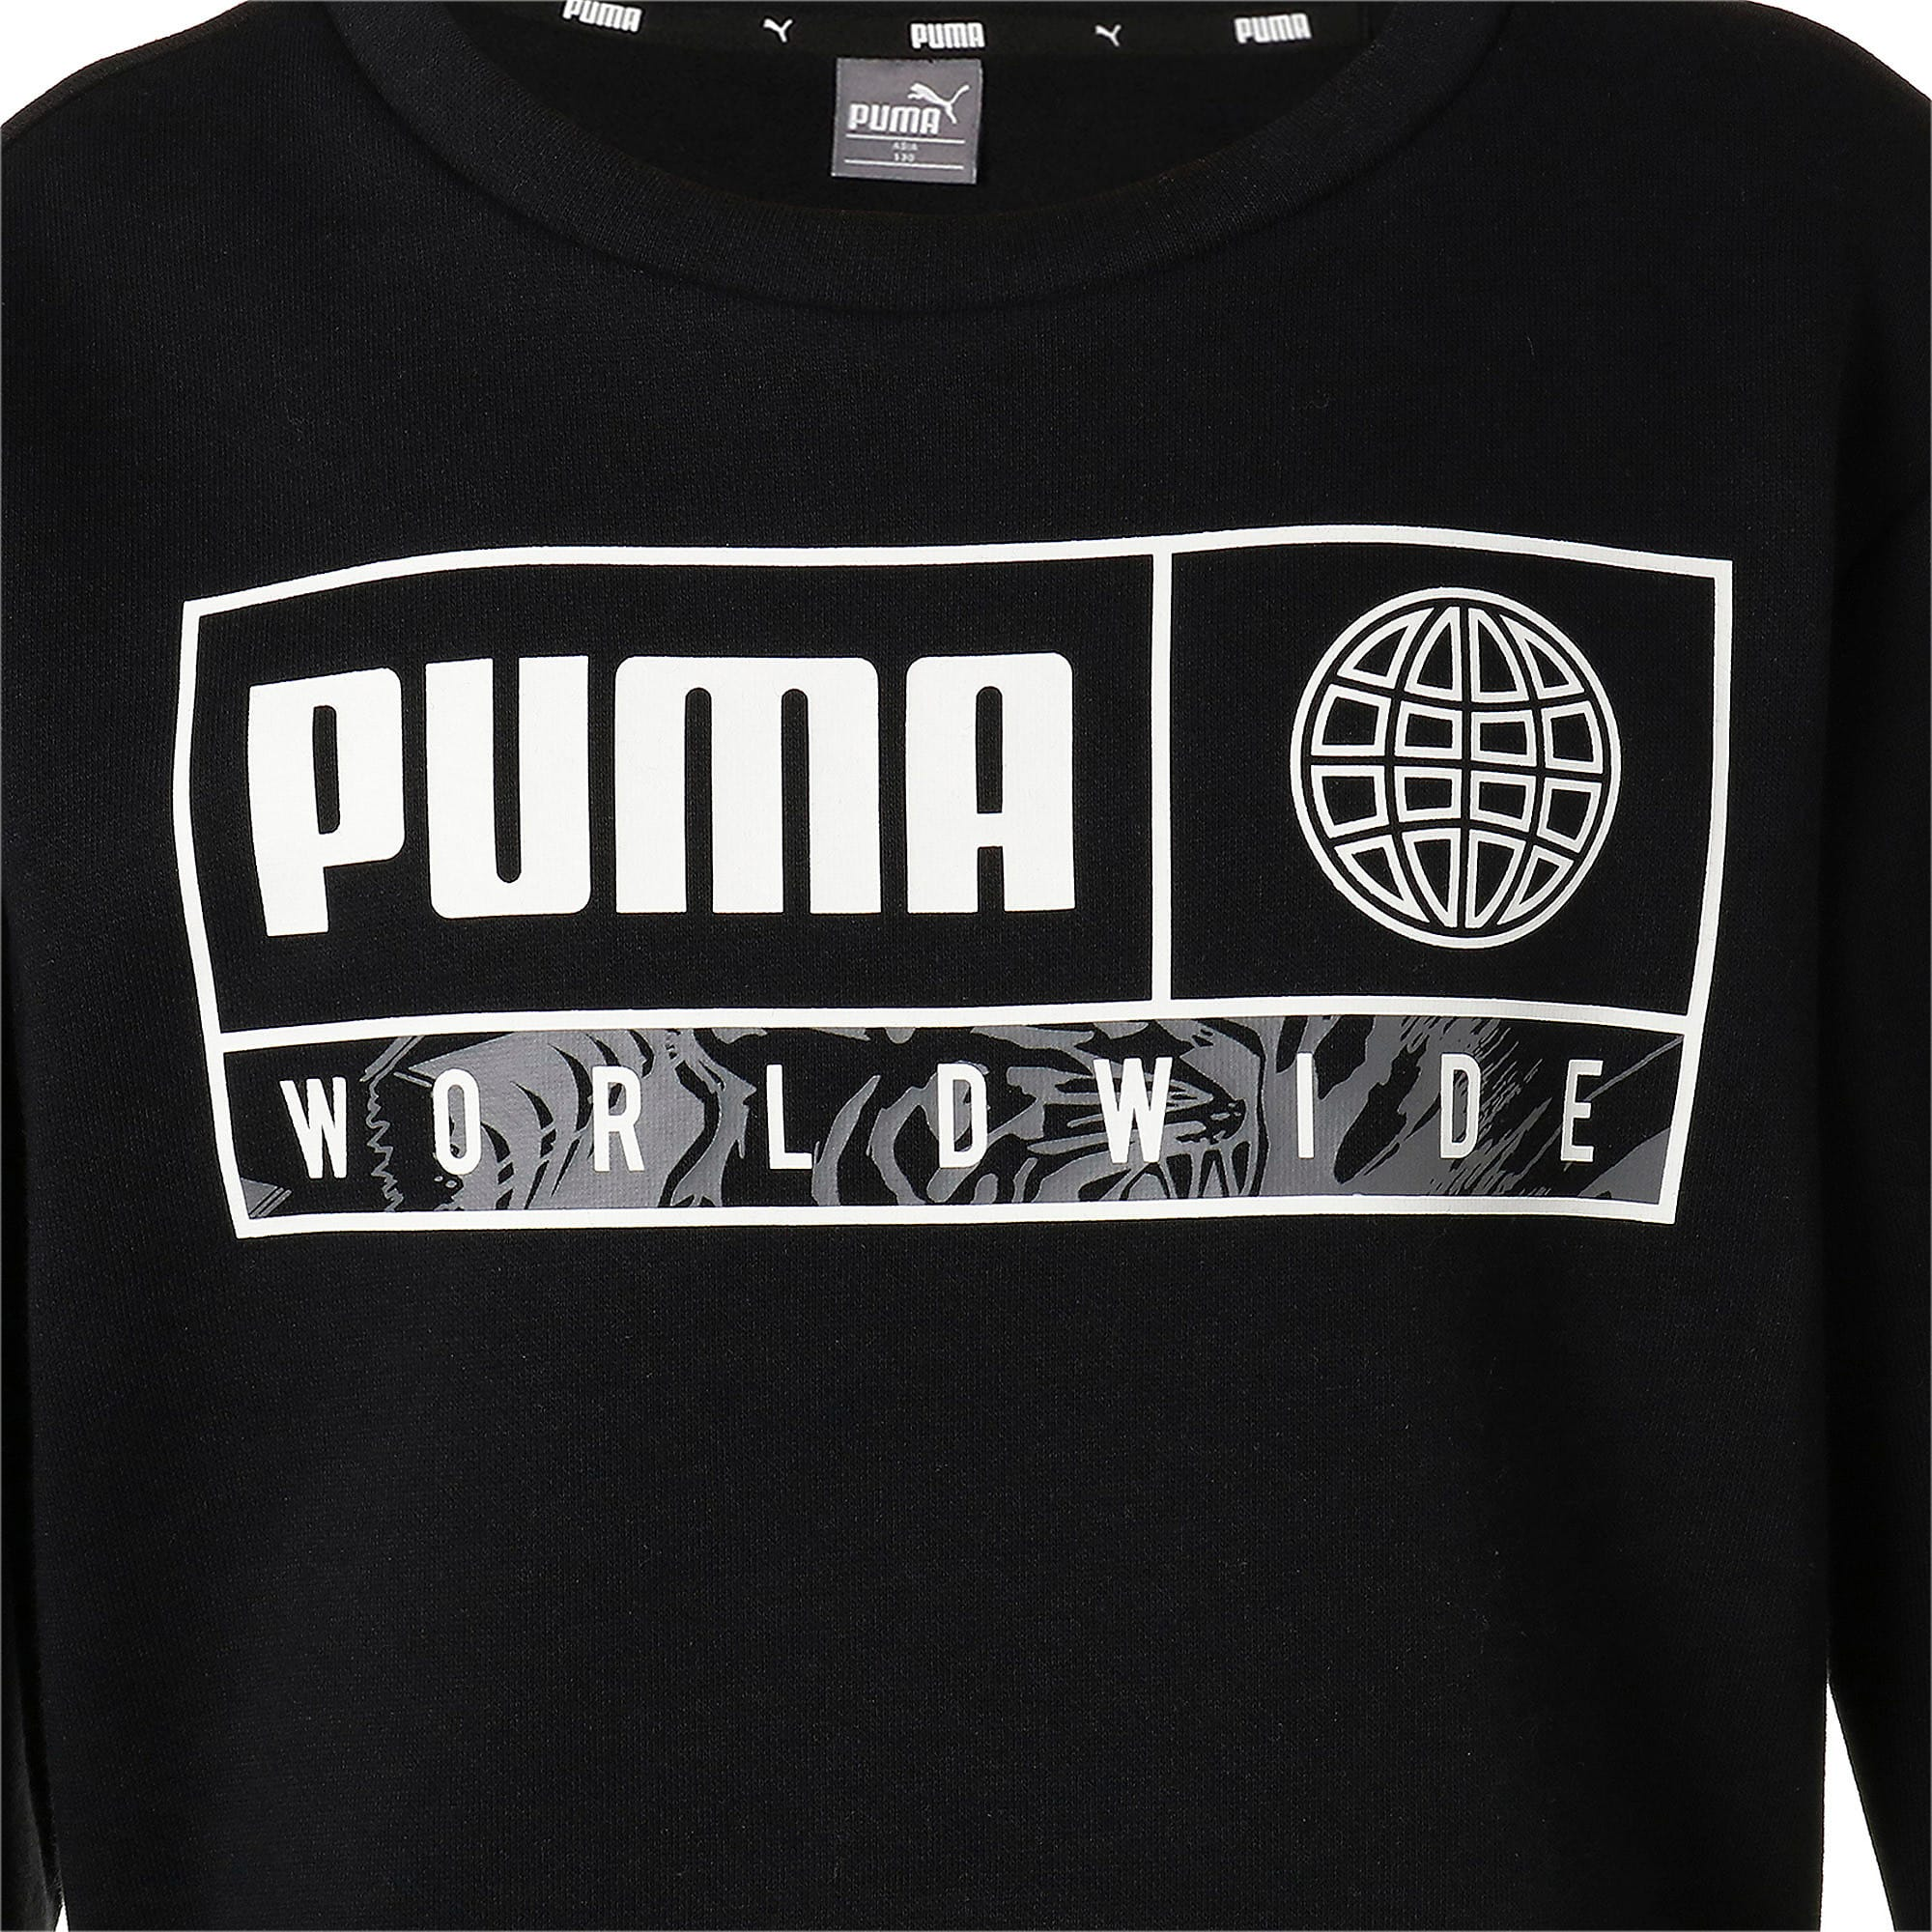 Thumbnail 4 of キッズ アルファ グラフィック クルー スウェット FL, Puma Black, medium-JPN